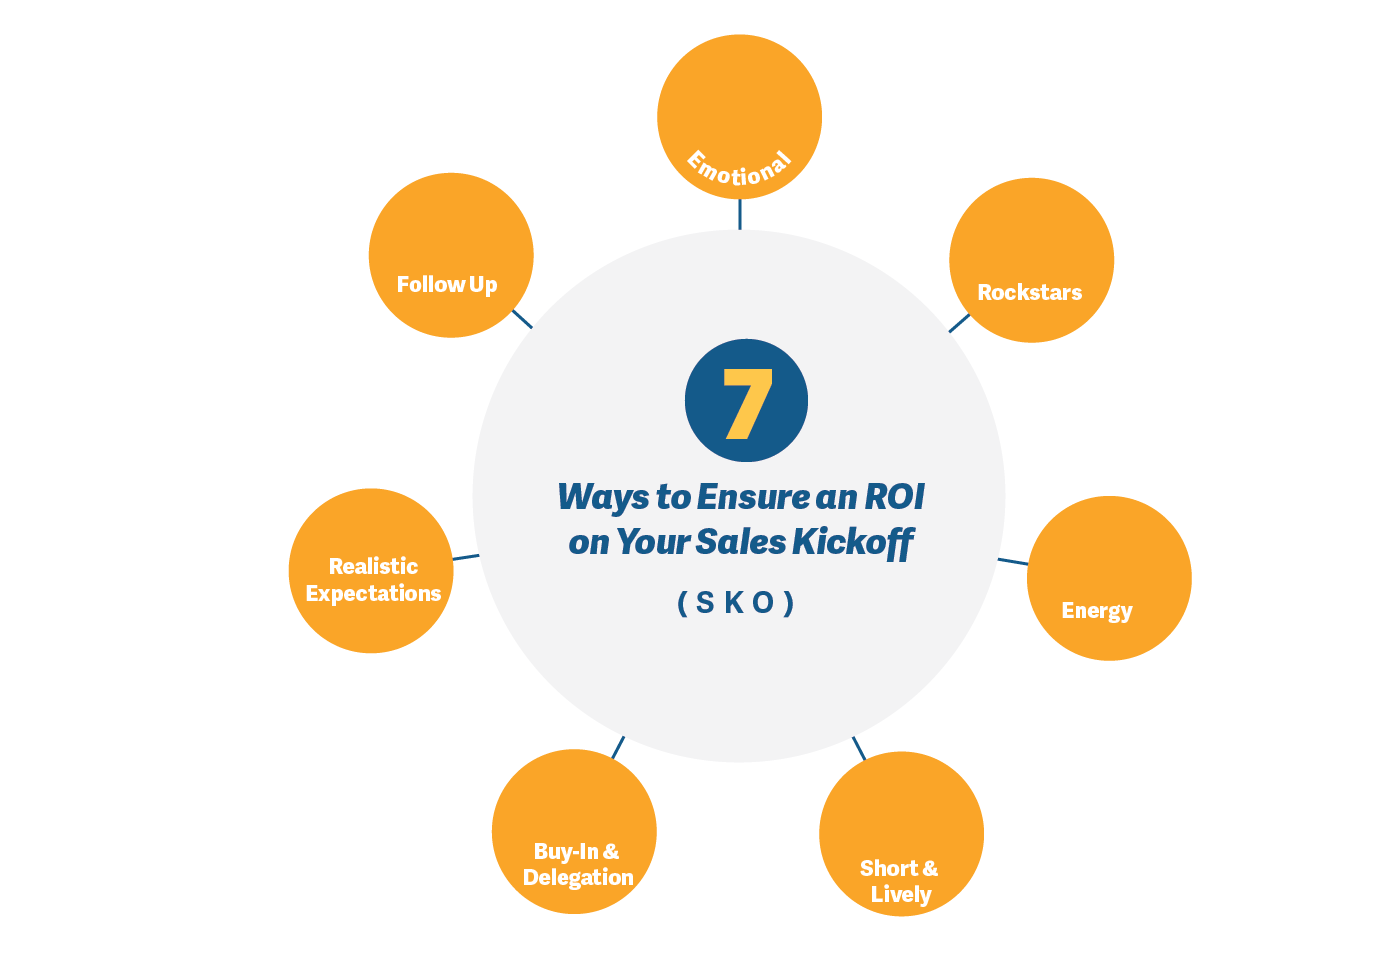 7 Ways to Ensure an ROI on Your Sales Kickoff (SKO)